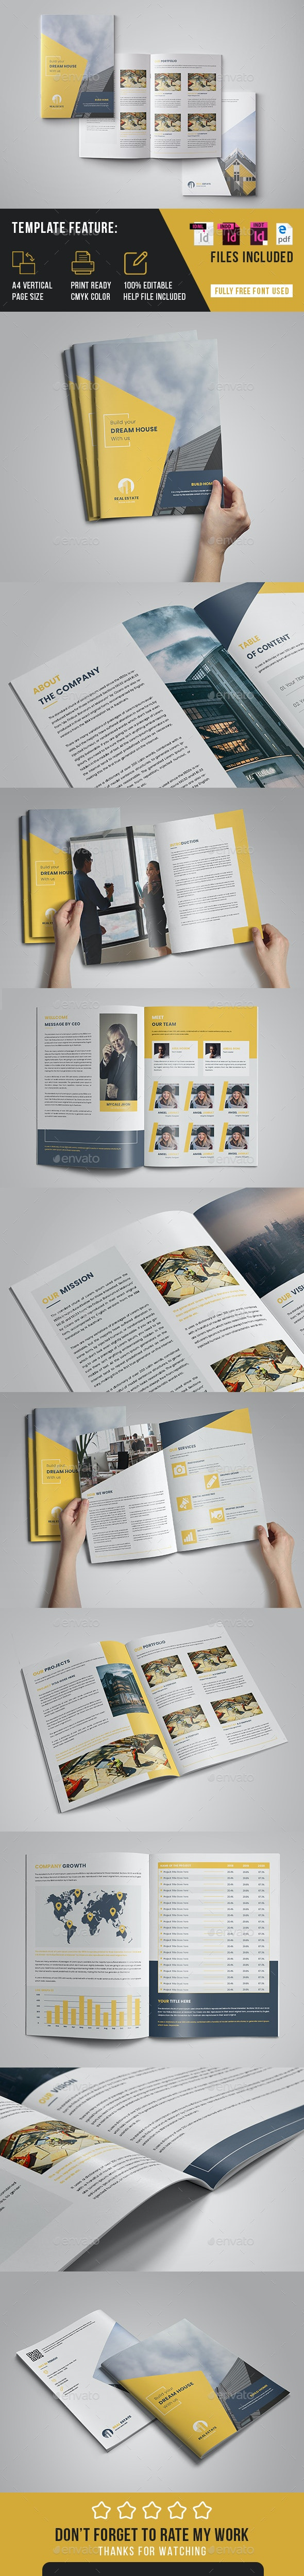 Realestate Brochure Indesign Template - Brochures Print Templates